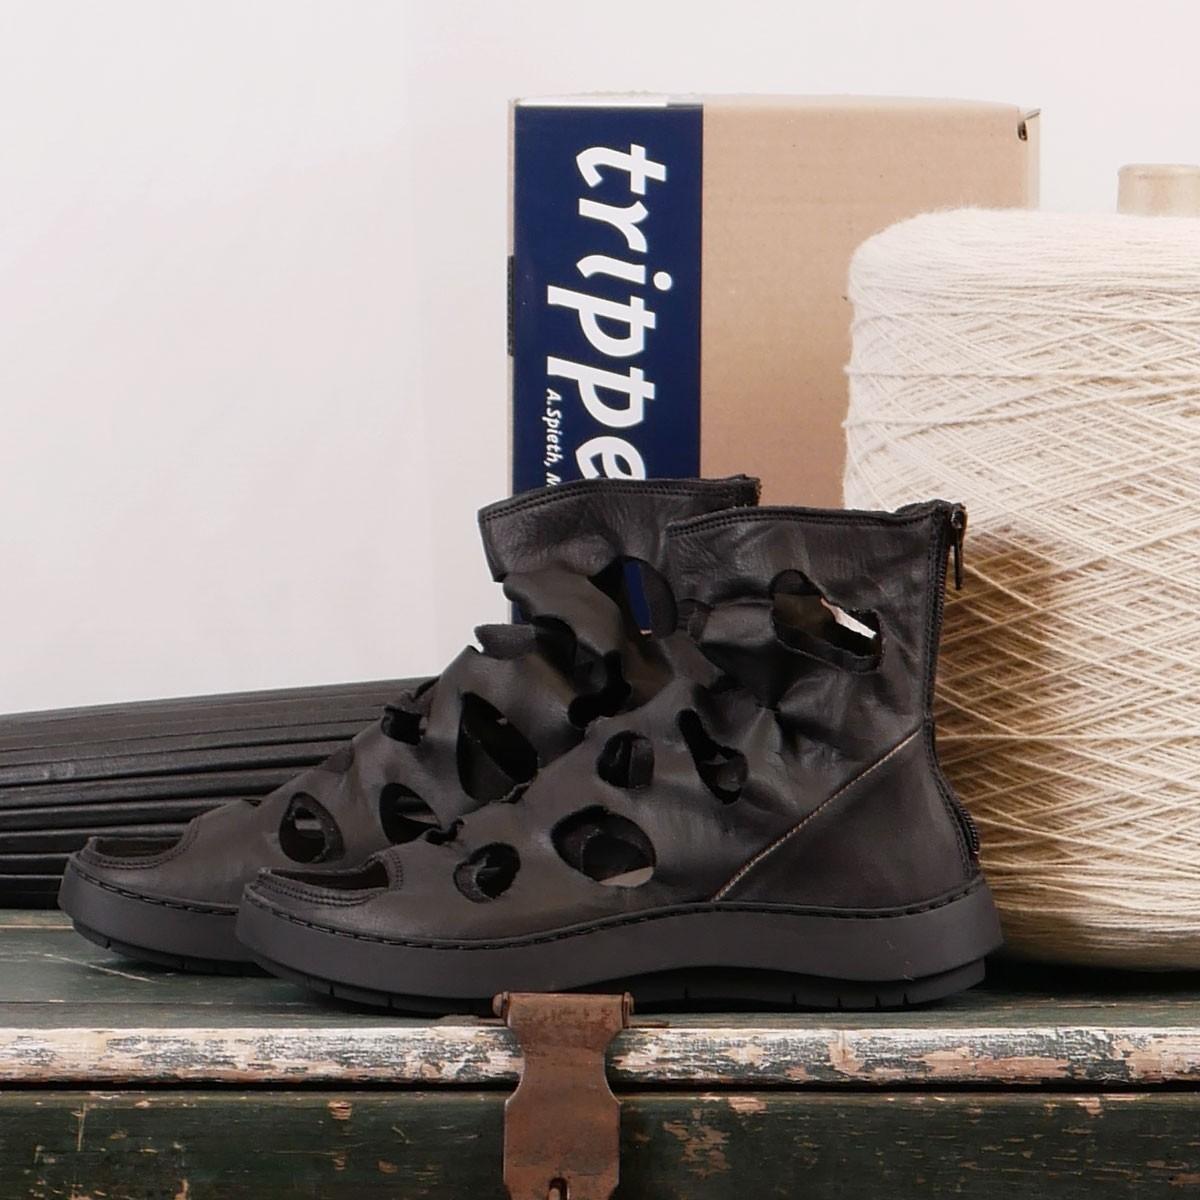 separation shoes dbf56 21b2c schuhe trippen   dacapo aachen